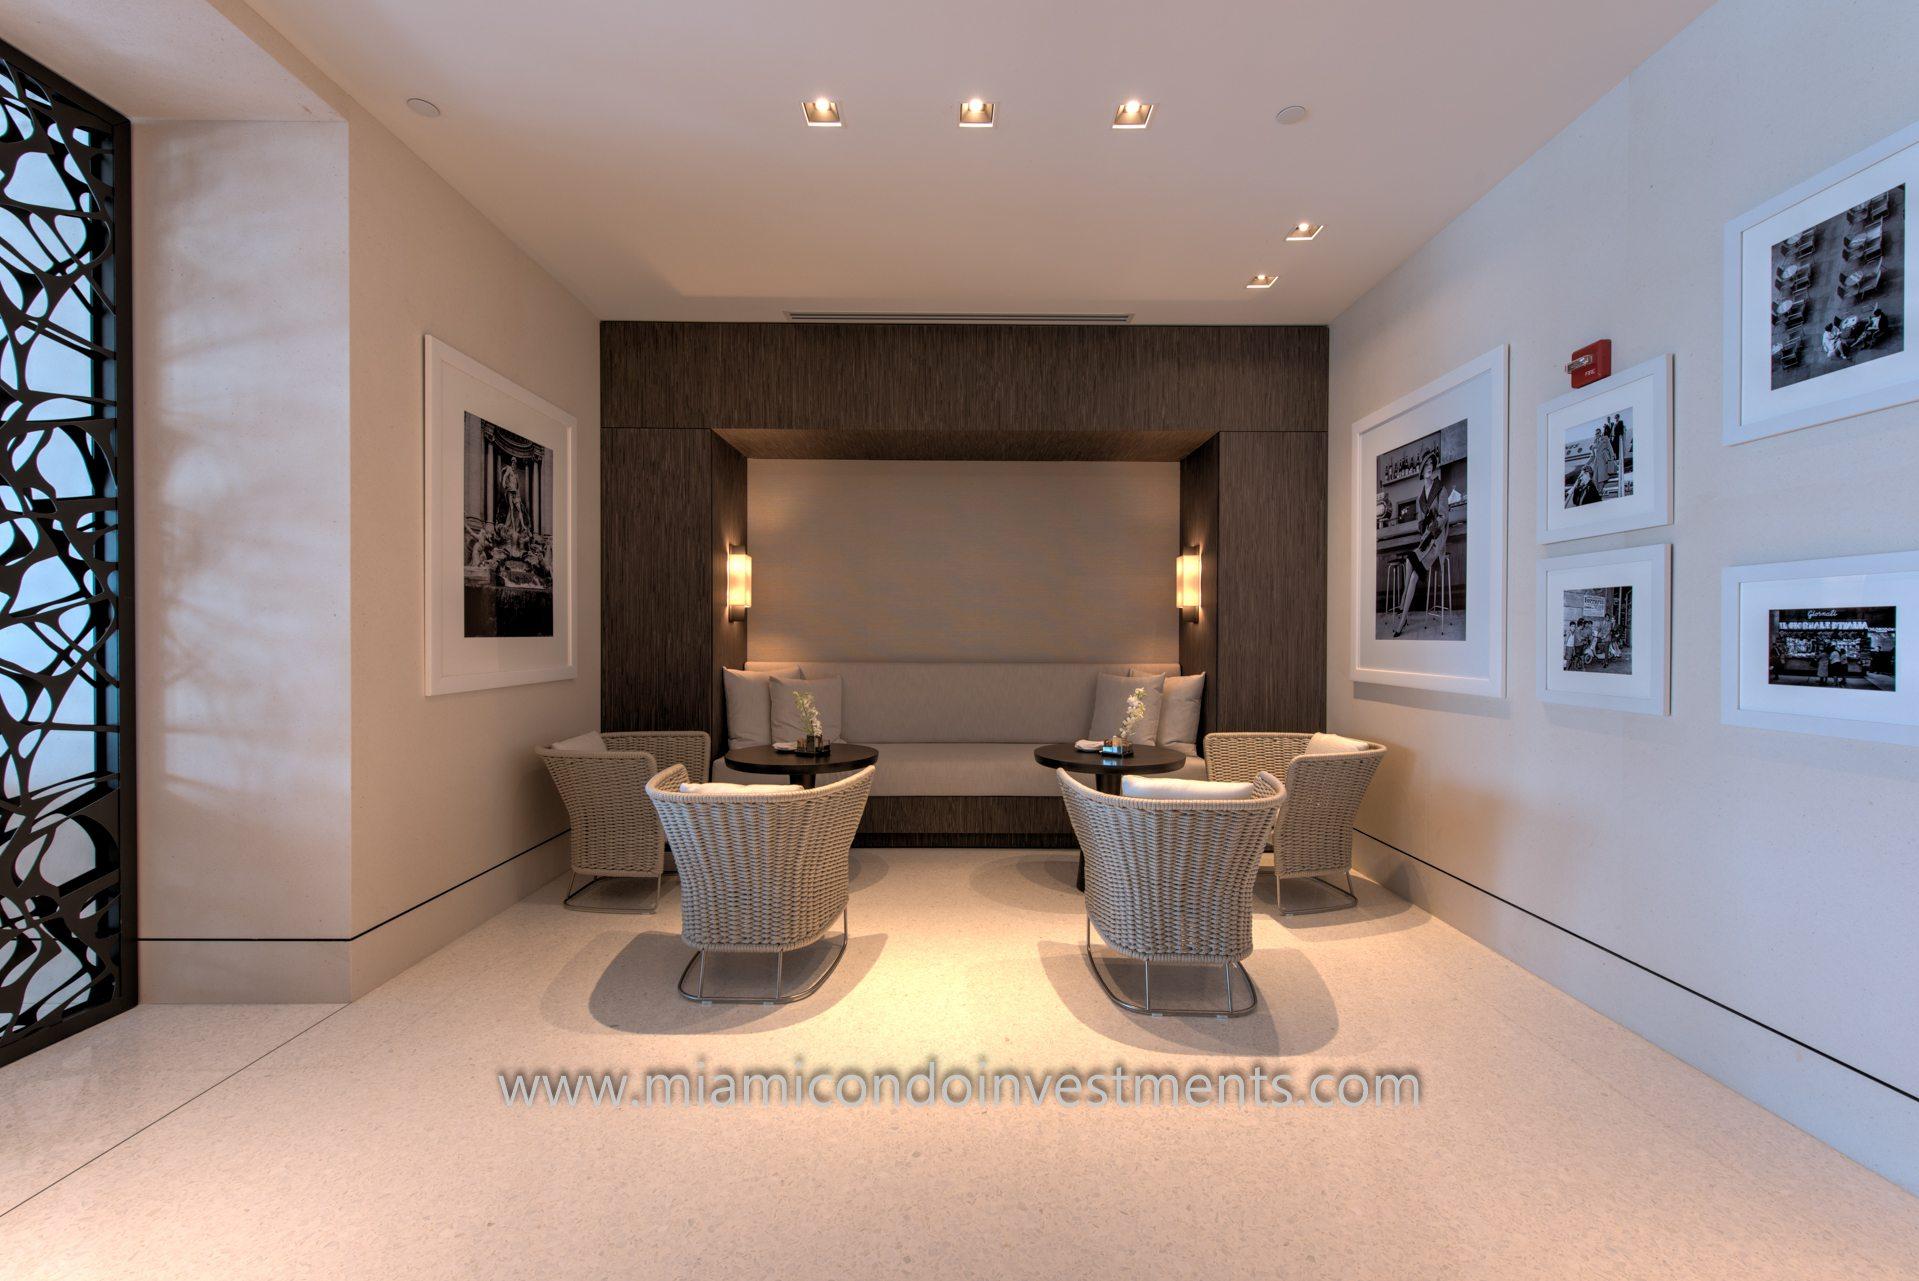 palazzo-del-sol-amenities-common-areas-6